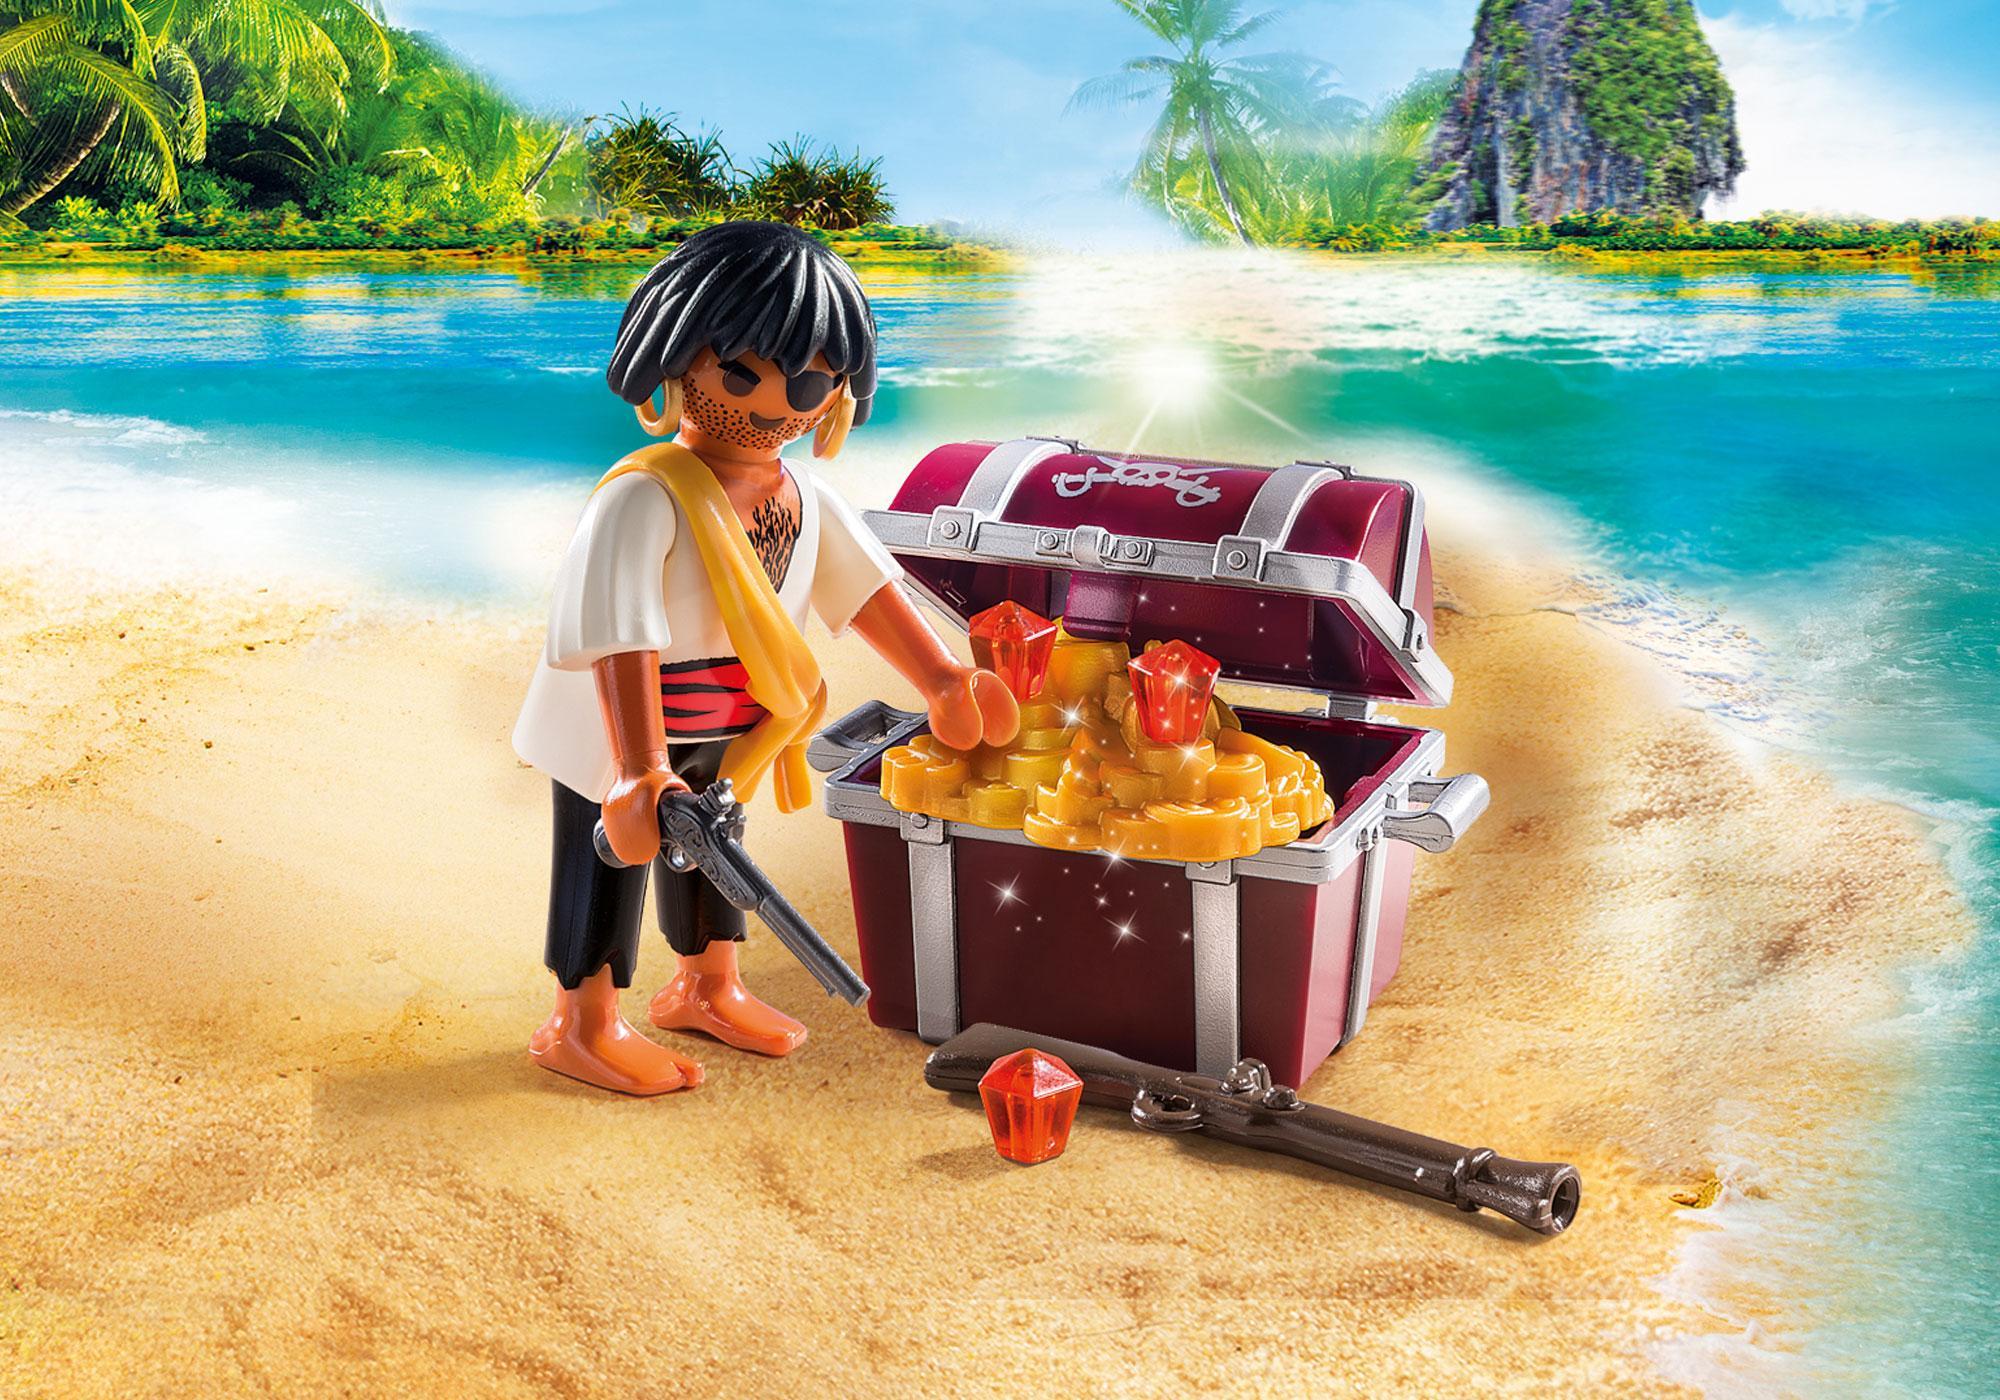 http://media.playmobil.com/i/playmobil/9358_product_detail/Pirata con scrigno del tesoro